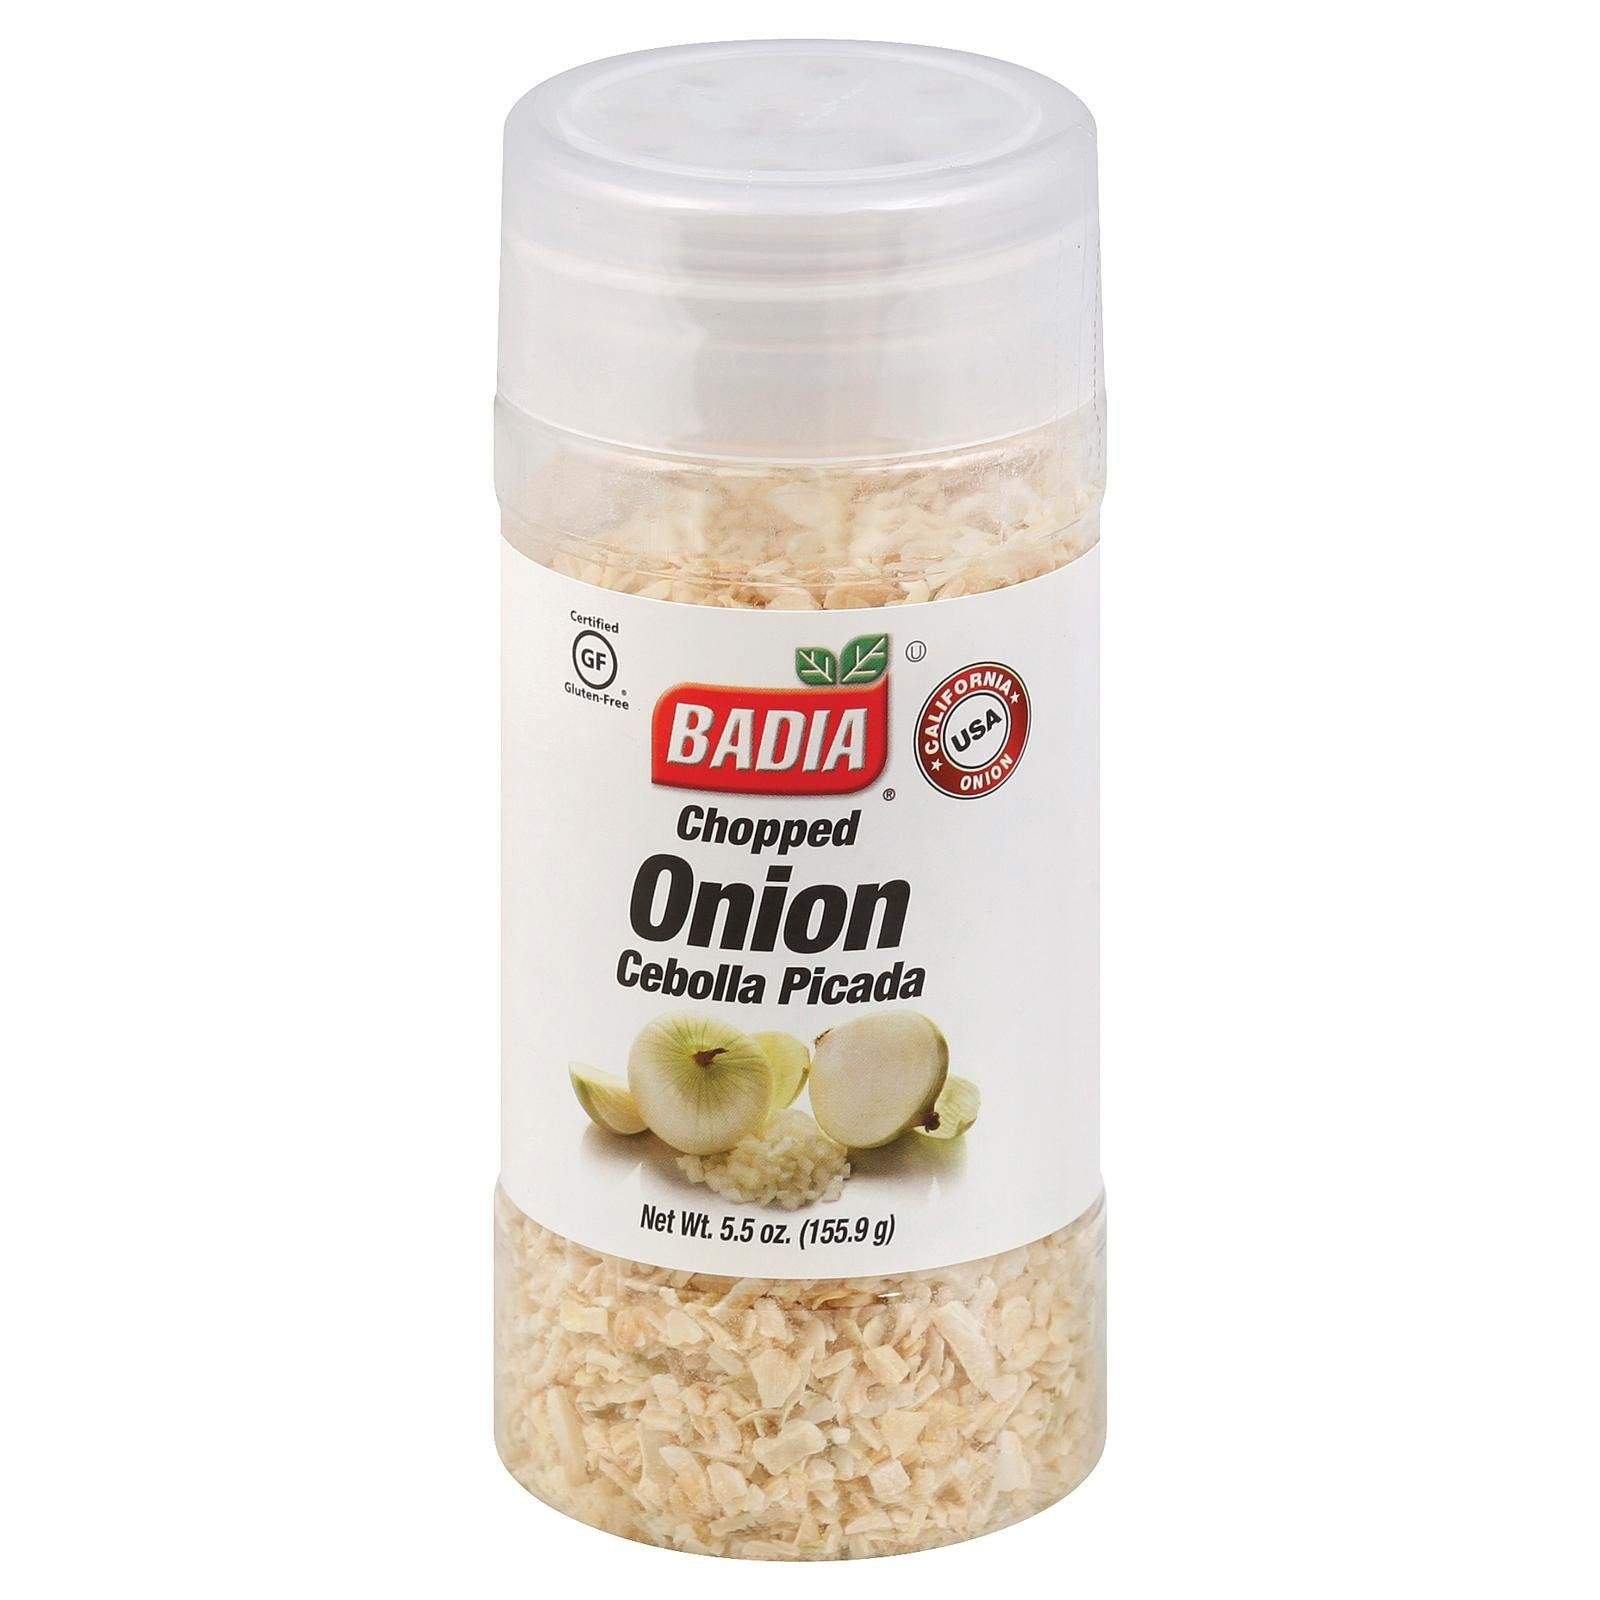 Badia Spices Chopped Onion - Case Of 12 - 5.5 Oz.  #organic #love #inspiredbeacon  #FoodBeverages #Salt #SpicesAndSeasonings